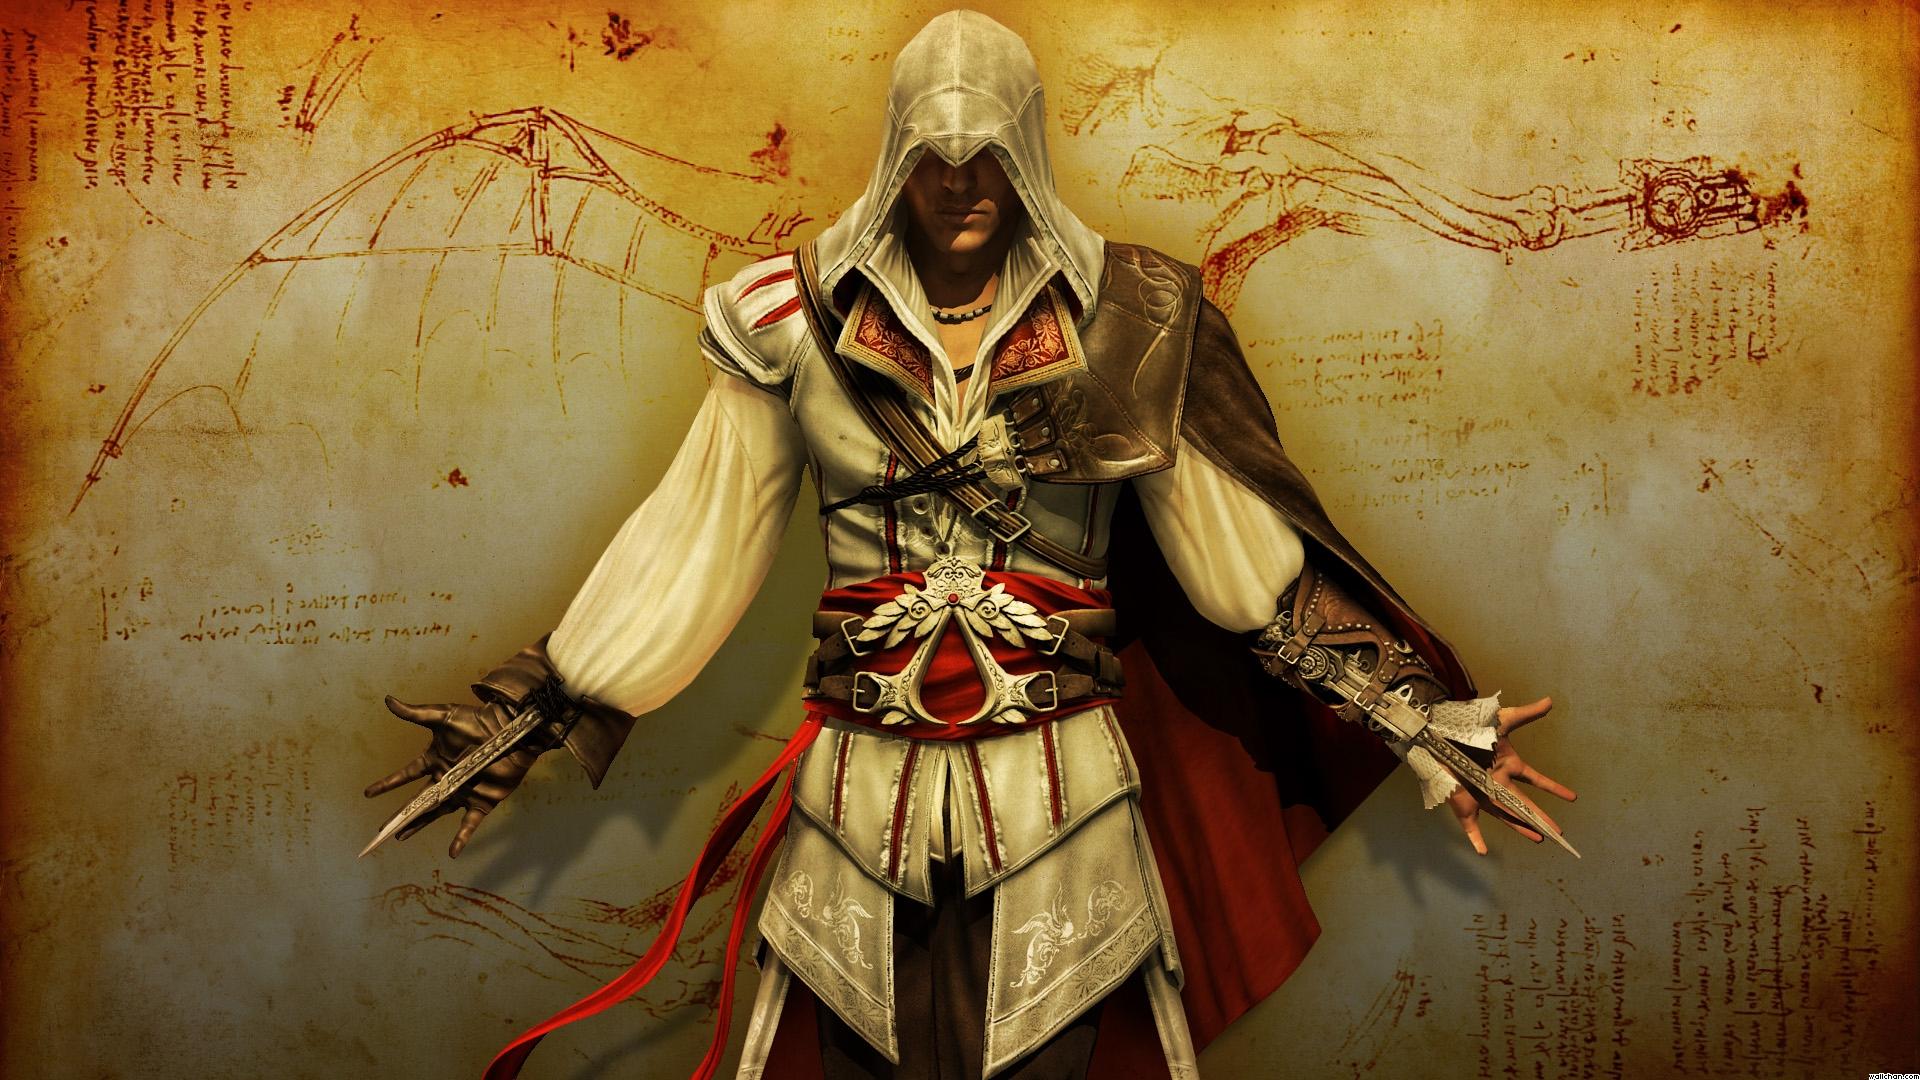 1305912034-assassin-assassins-creed-ezio-wallpaper.jpg